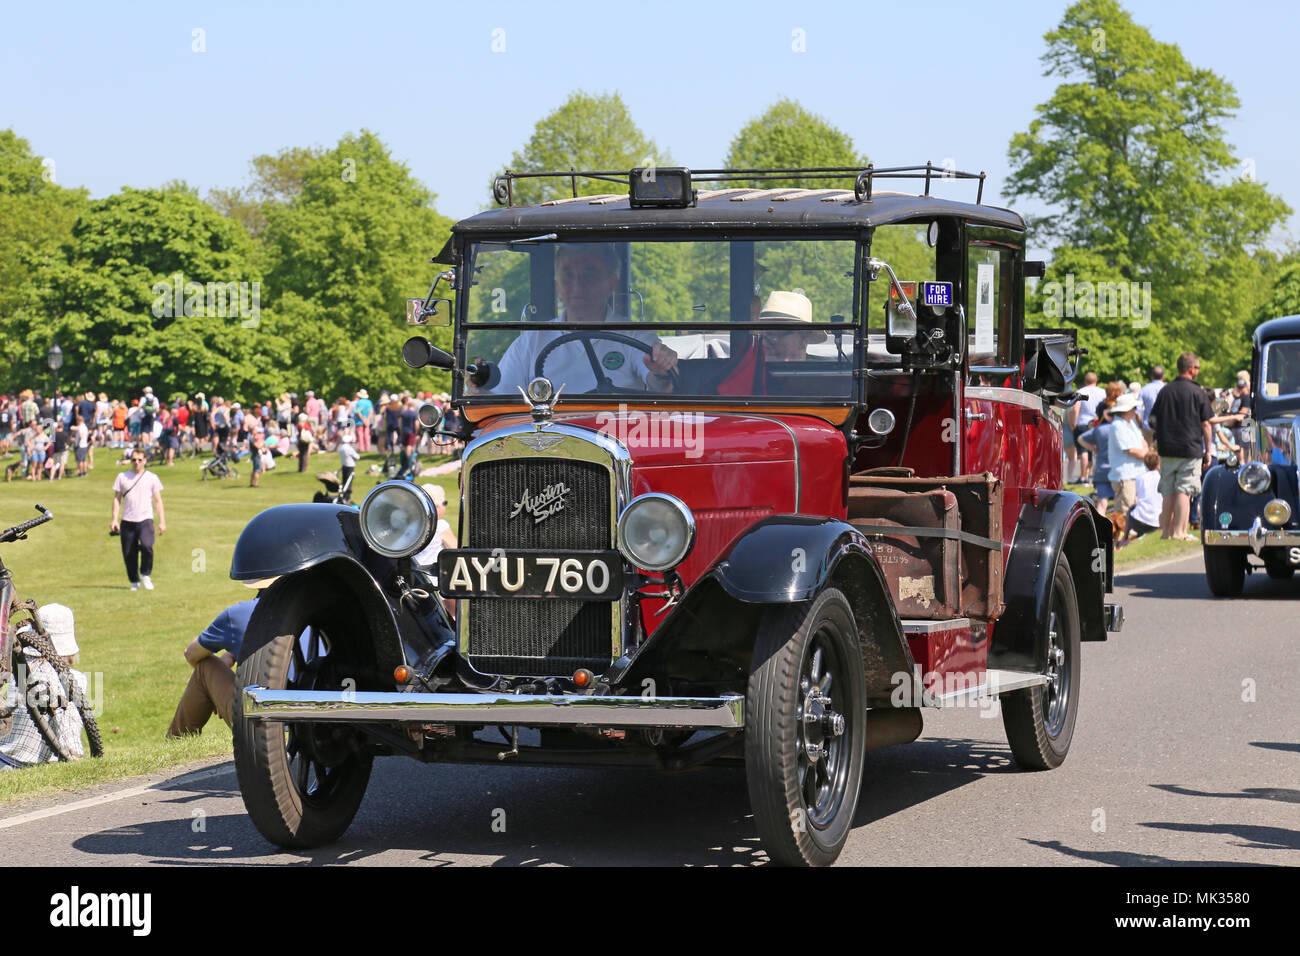 1934 austin sechs tieflader taxi chestnut sonntag 6 mai 2018 bushy park